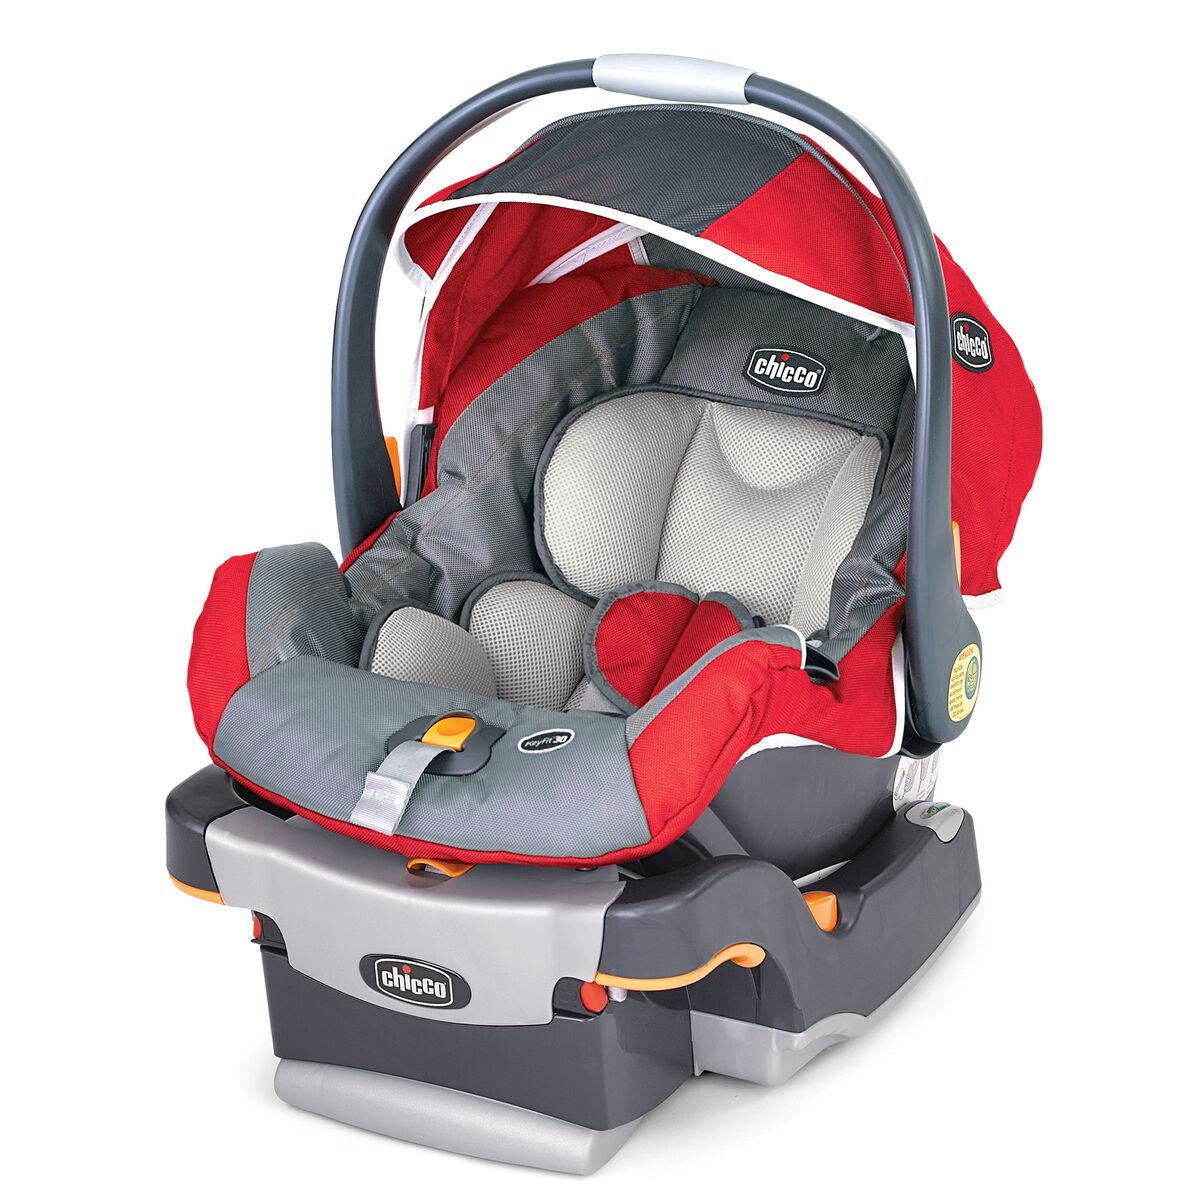 Keyfit 30 infant car seat base pulsekeyfit 30 infant car seat and base pulse